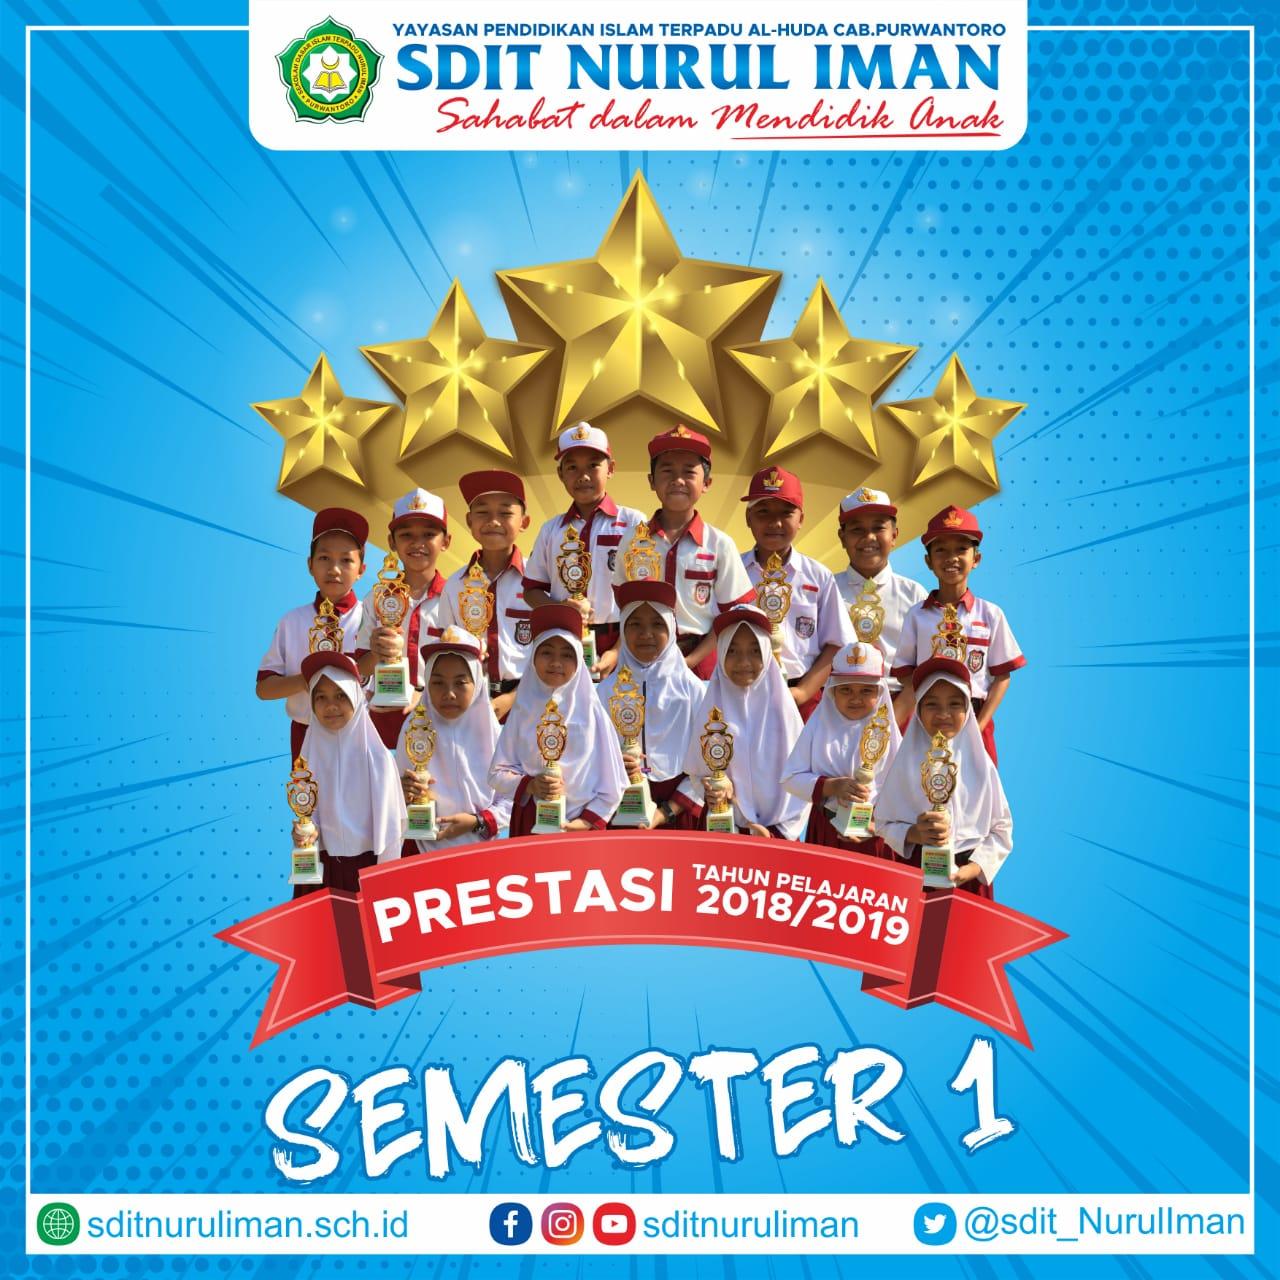 Prestasi SDIT Nurul Iman Purwantoro Semester I